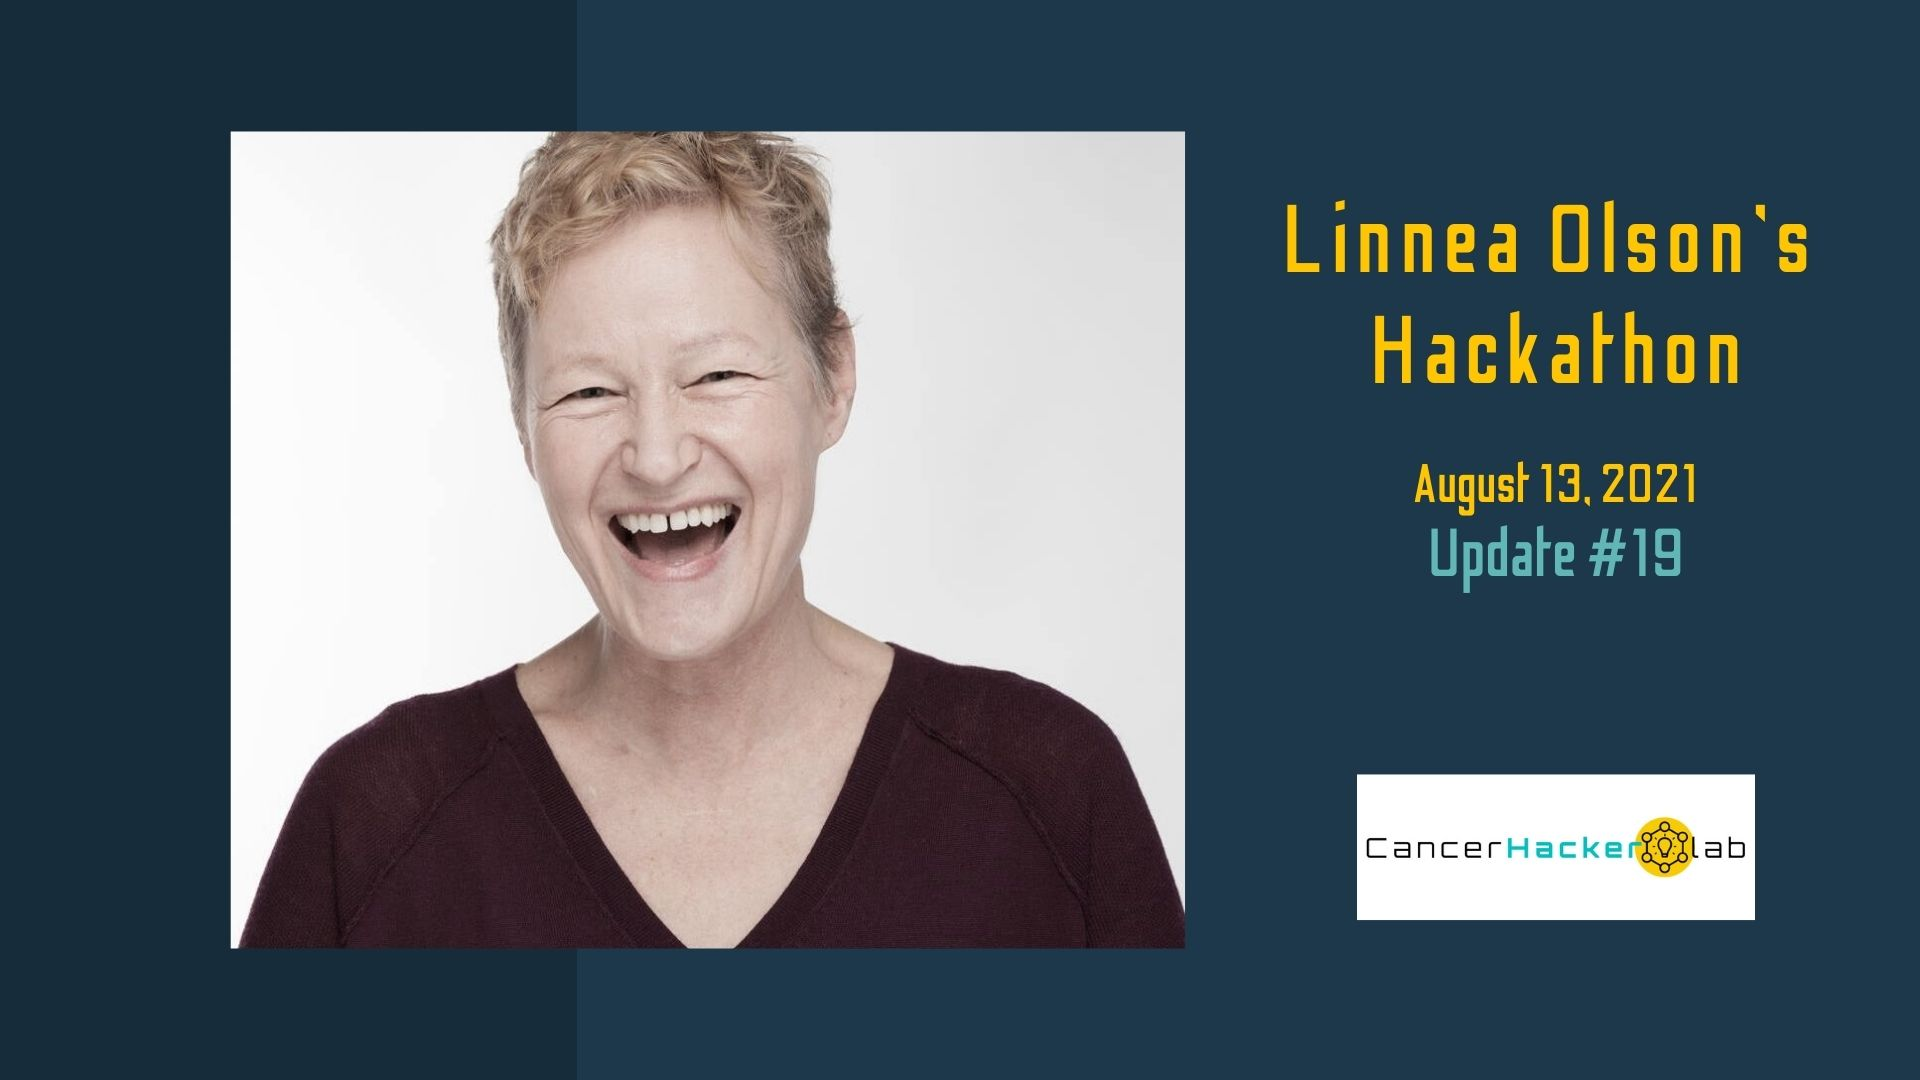 Linnea Olson Update 19